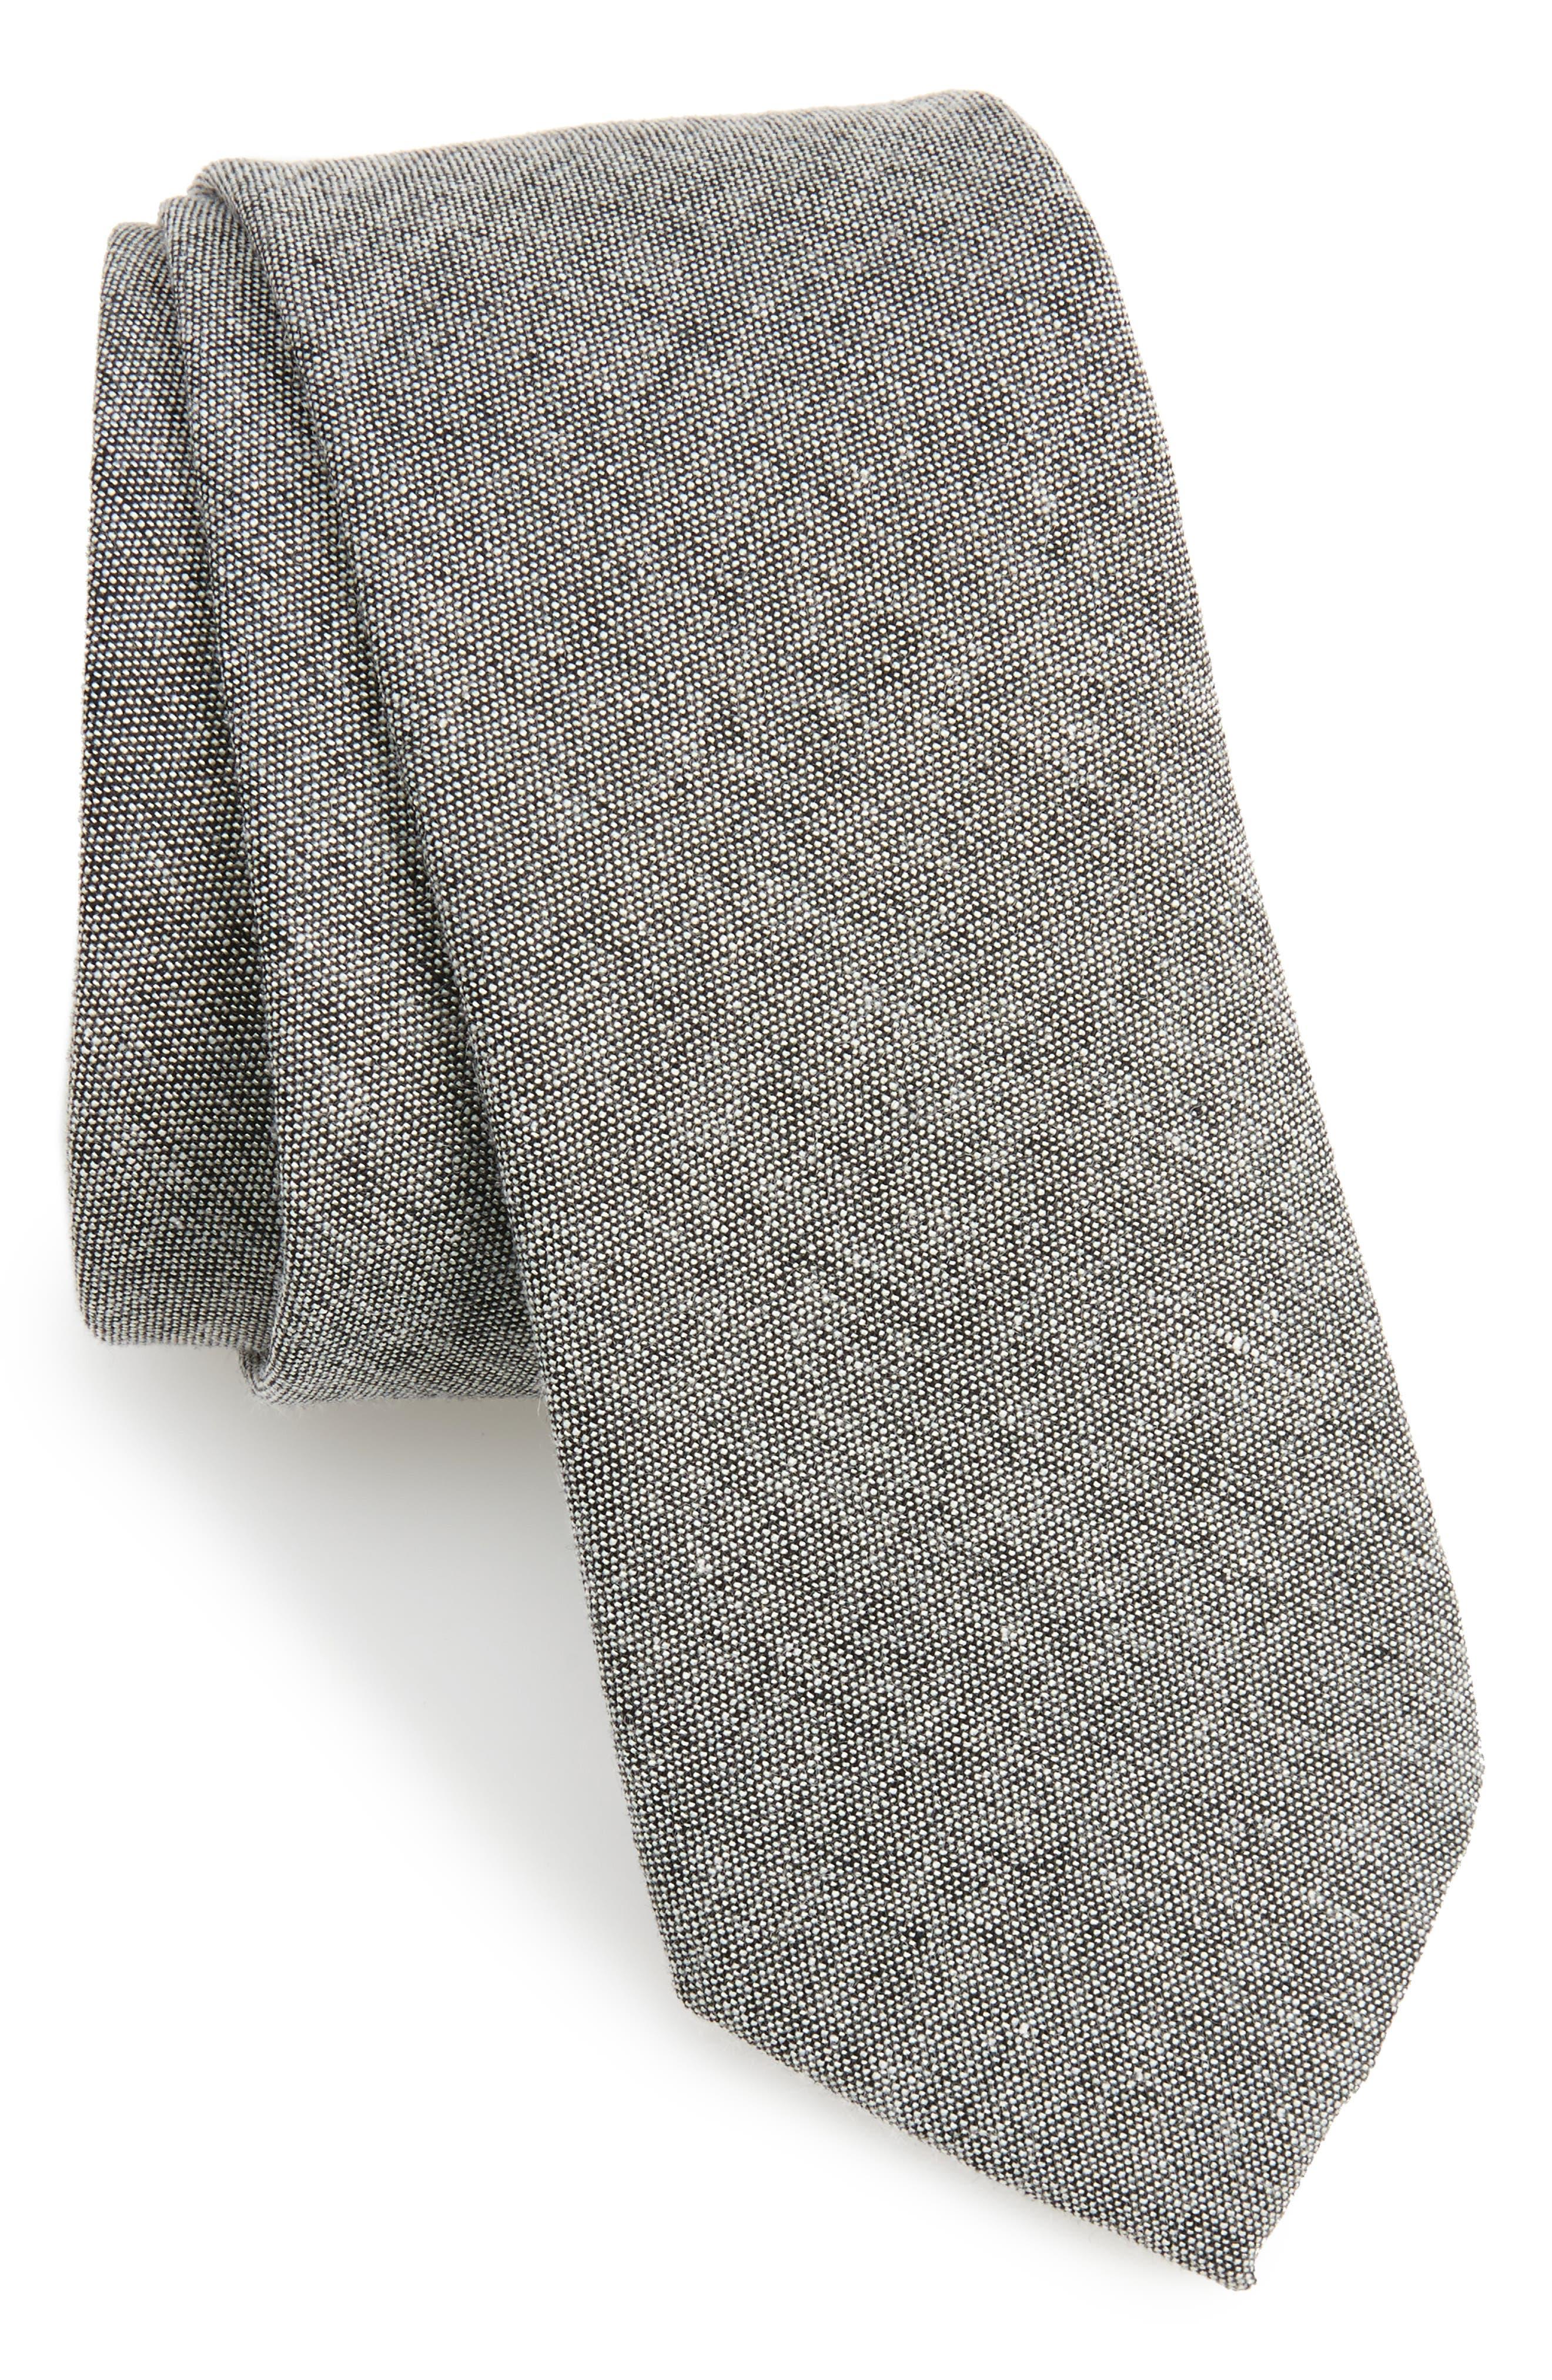 Alternate Image 1 Selected - Nordstrom Men's Shop Textured Skinny Tie